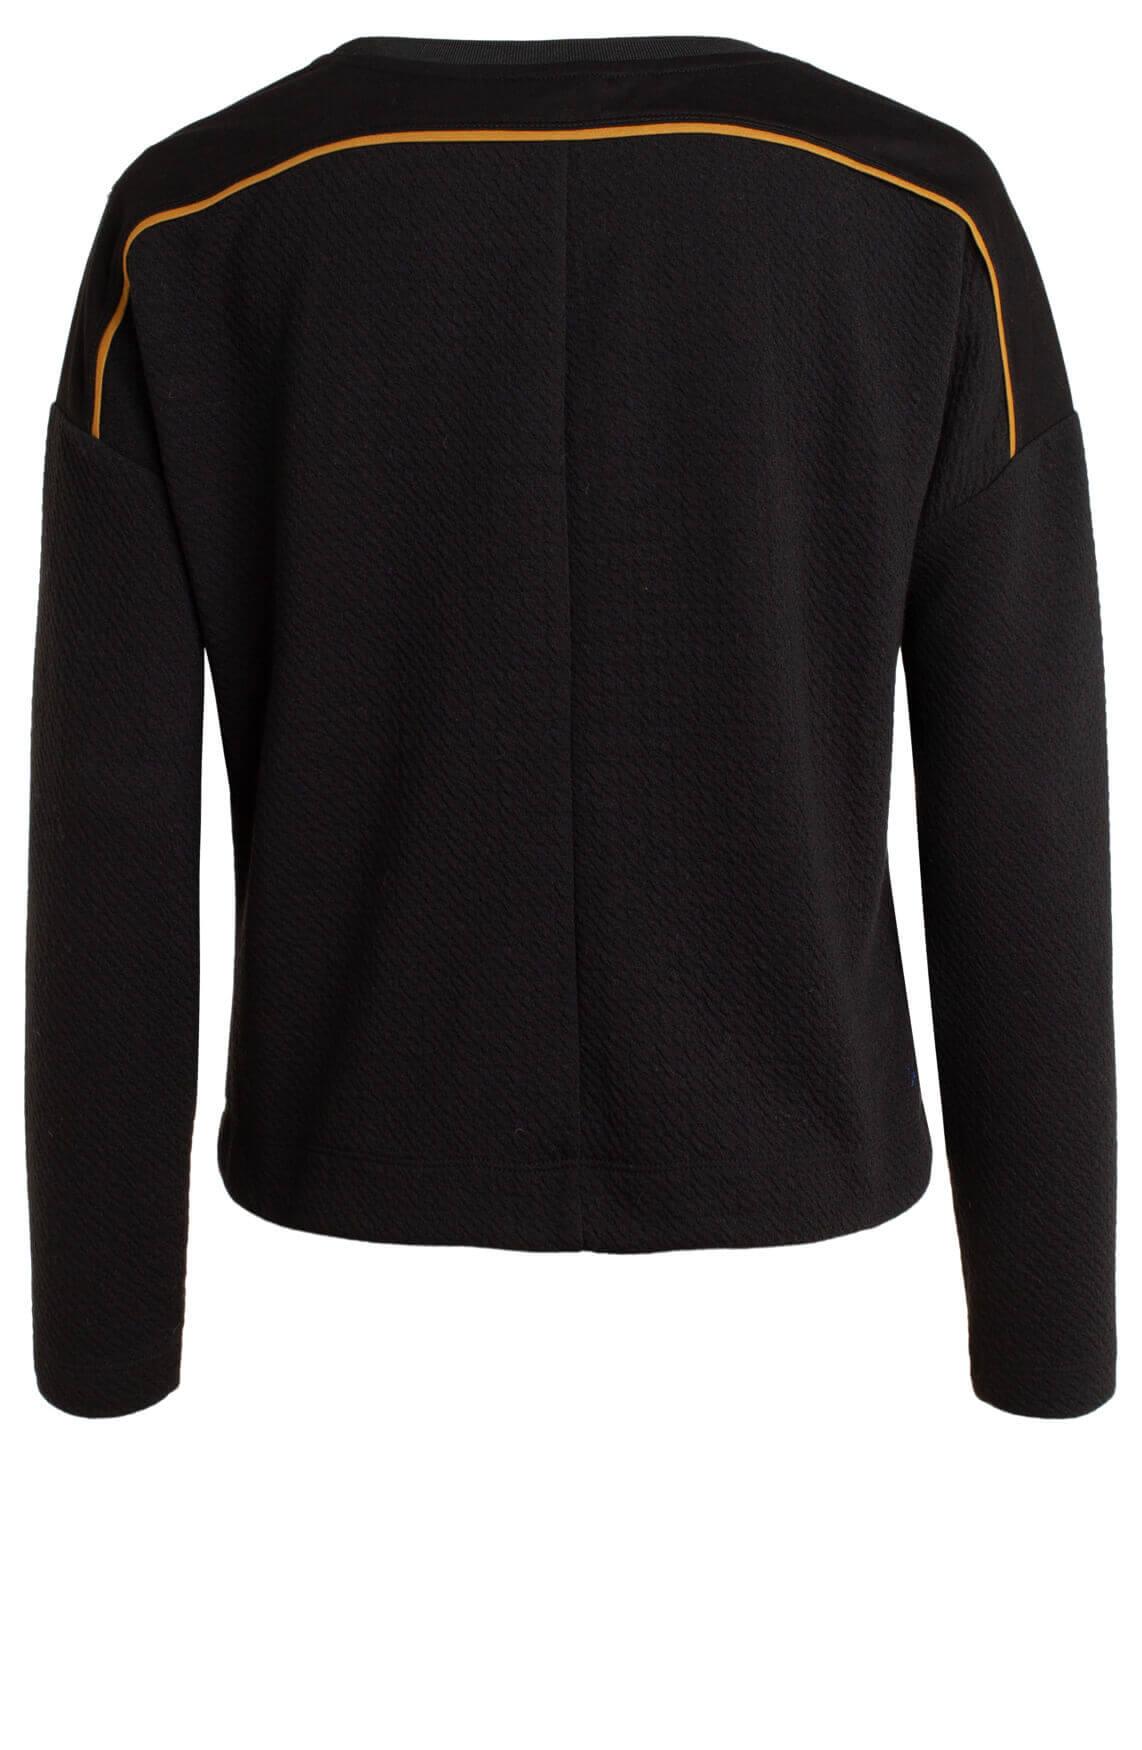 Anna Blue Dames Sweater met reliëf zwart